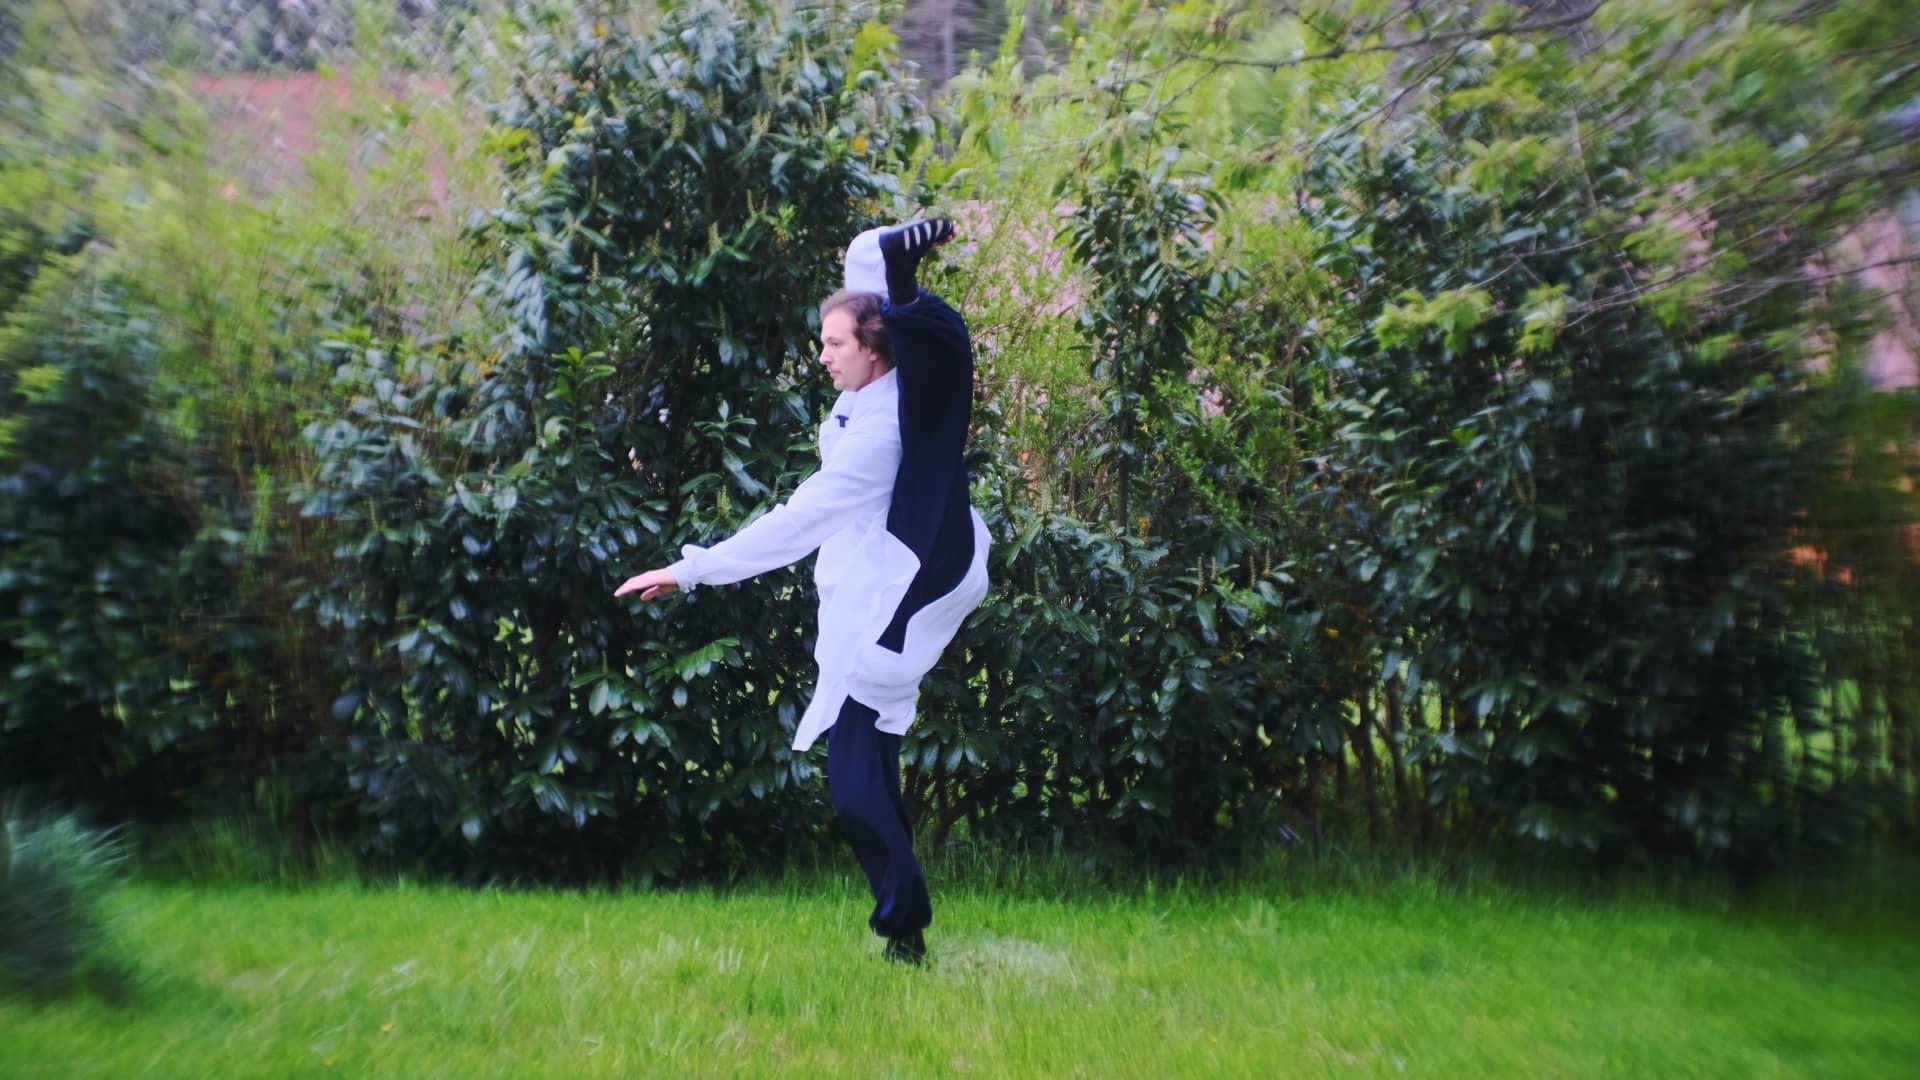 Basic Daoist Flexibility Training Course Part 12